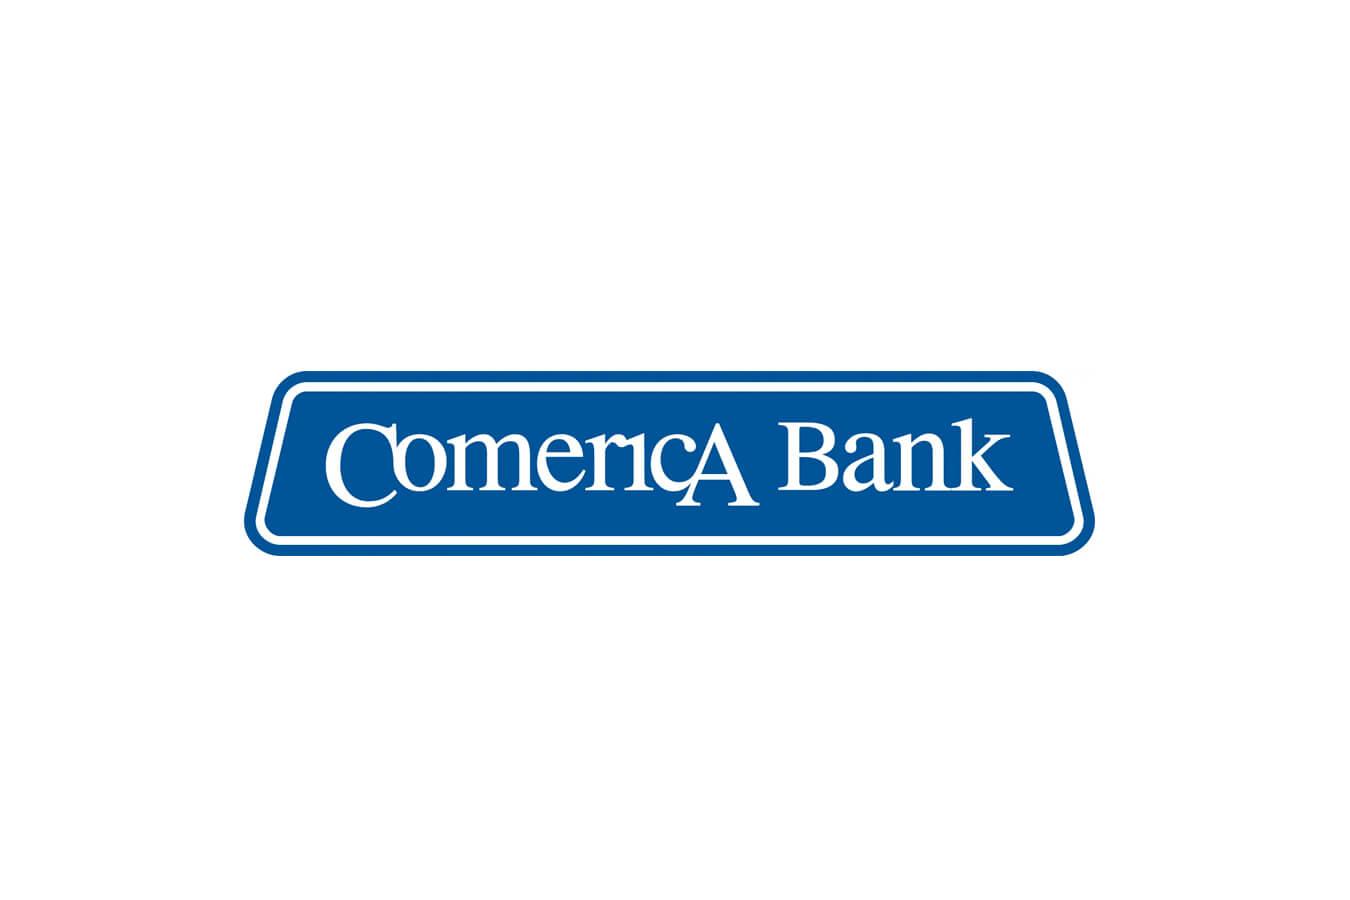 Comerica Bank.